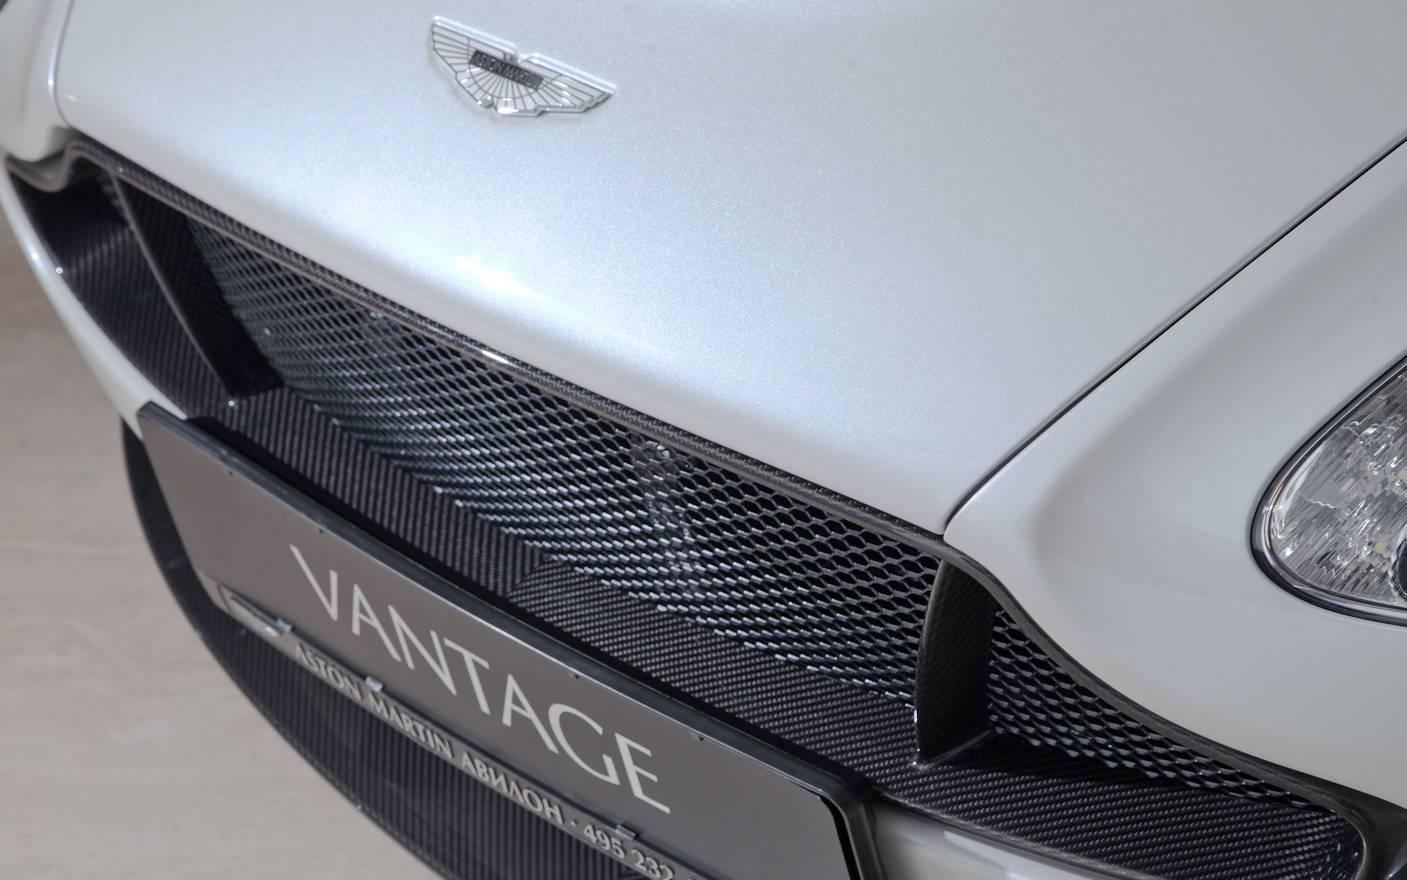 Aston Martin V12 Vantage S в наличии | купить Астон Мартин ...: http://www.astonmartin.ru/availability/v12-vantage-s/